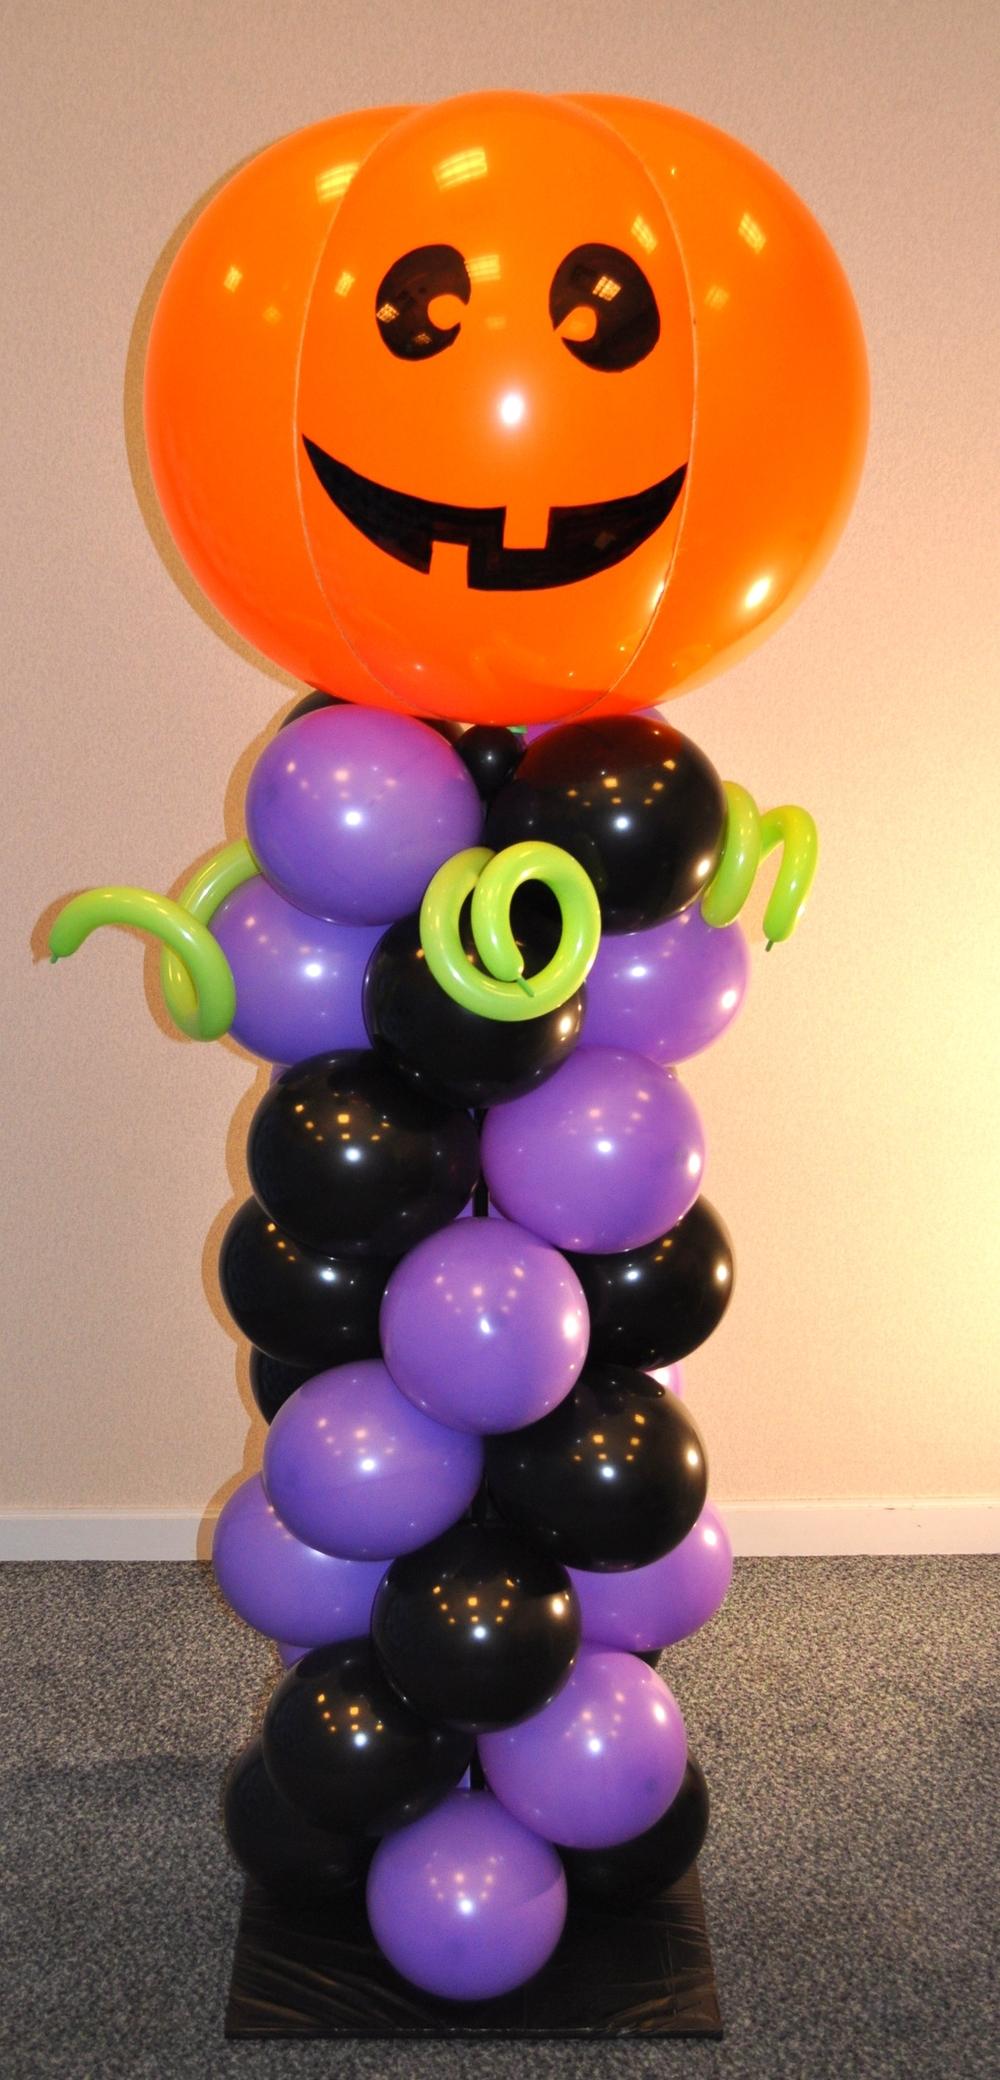 Jack 'o lantern balloon column